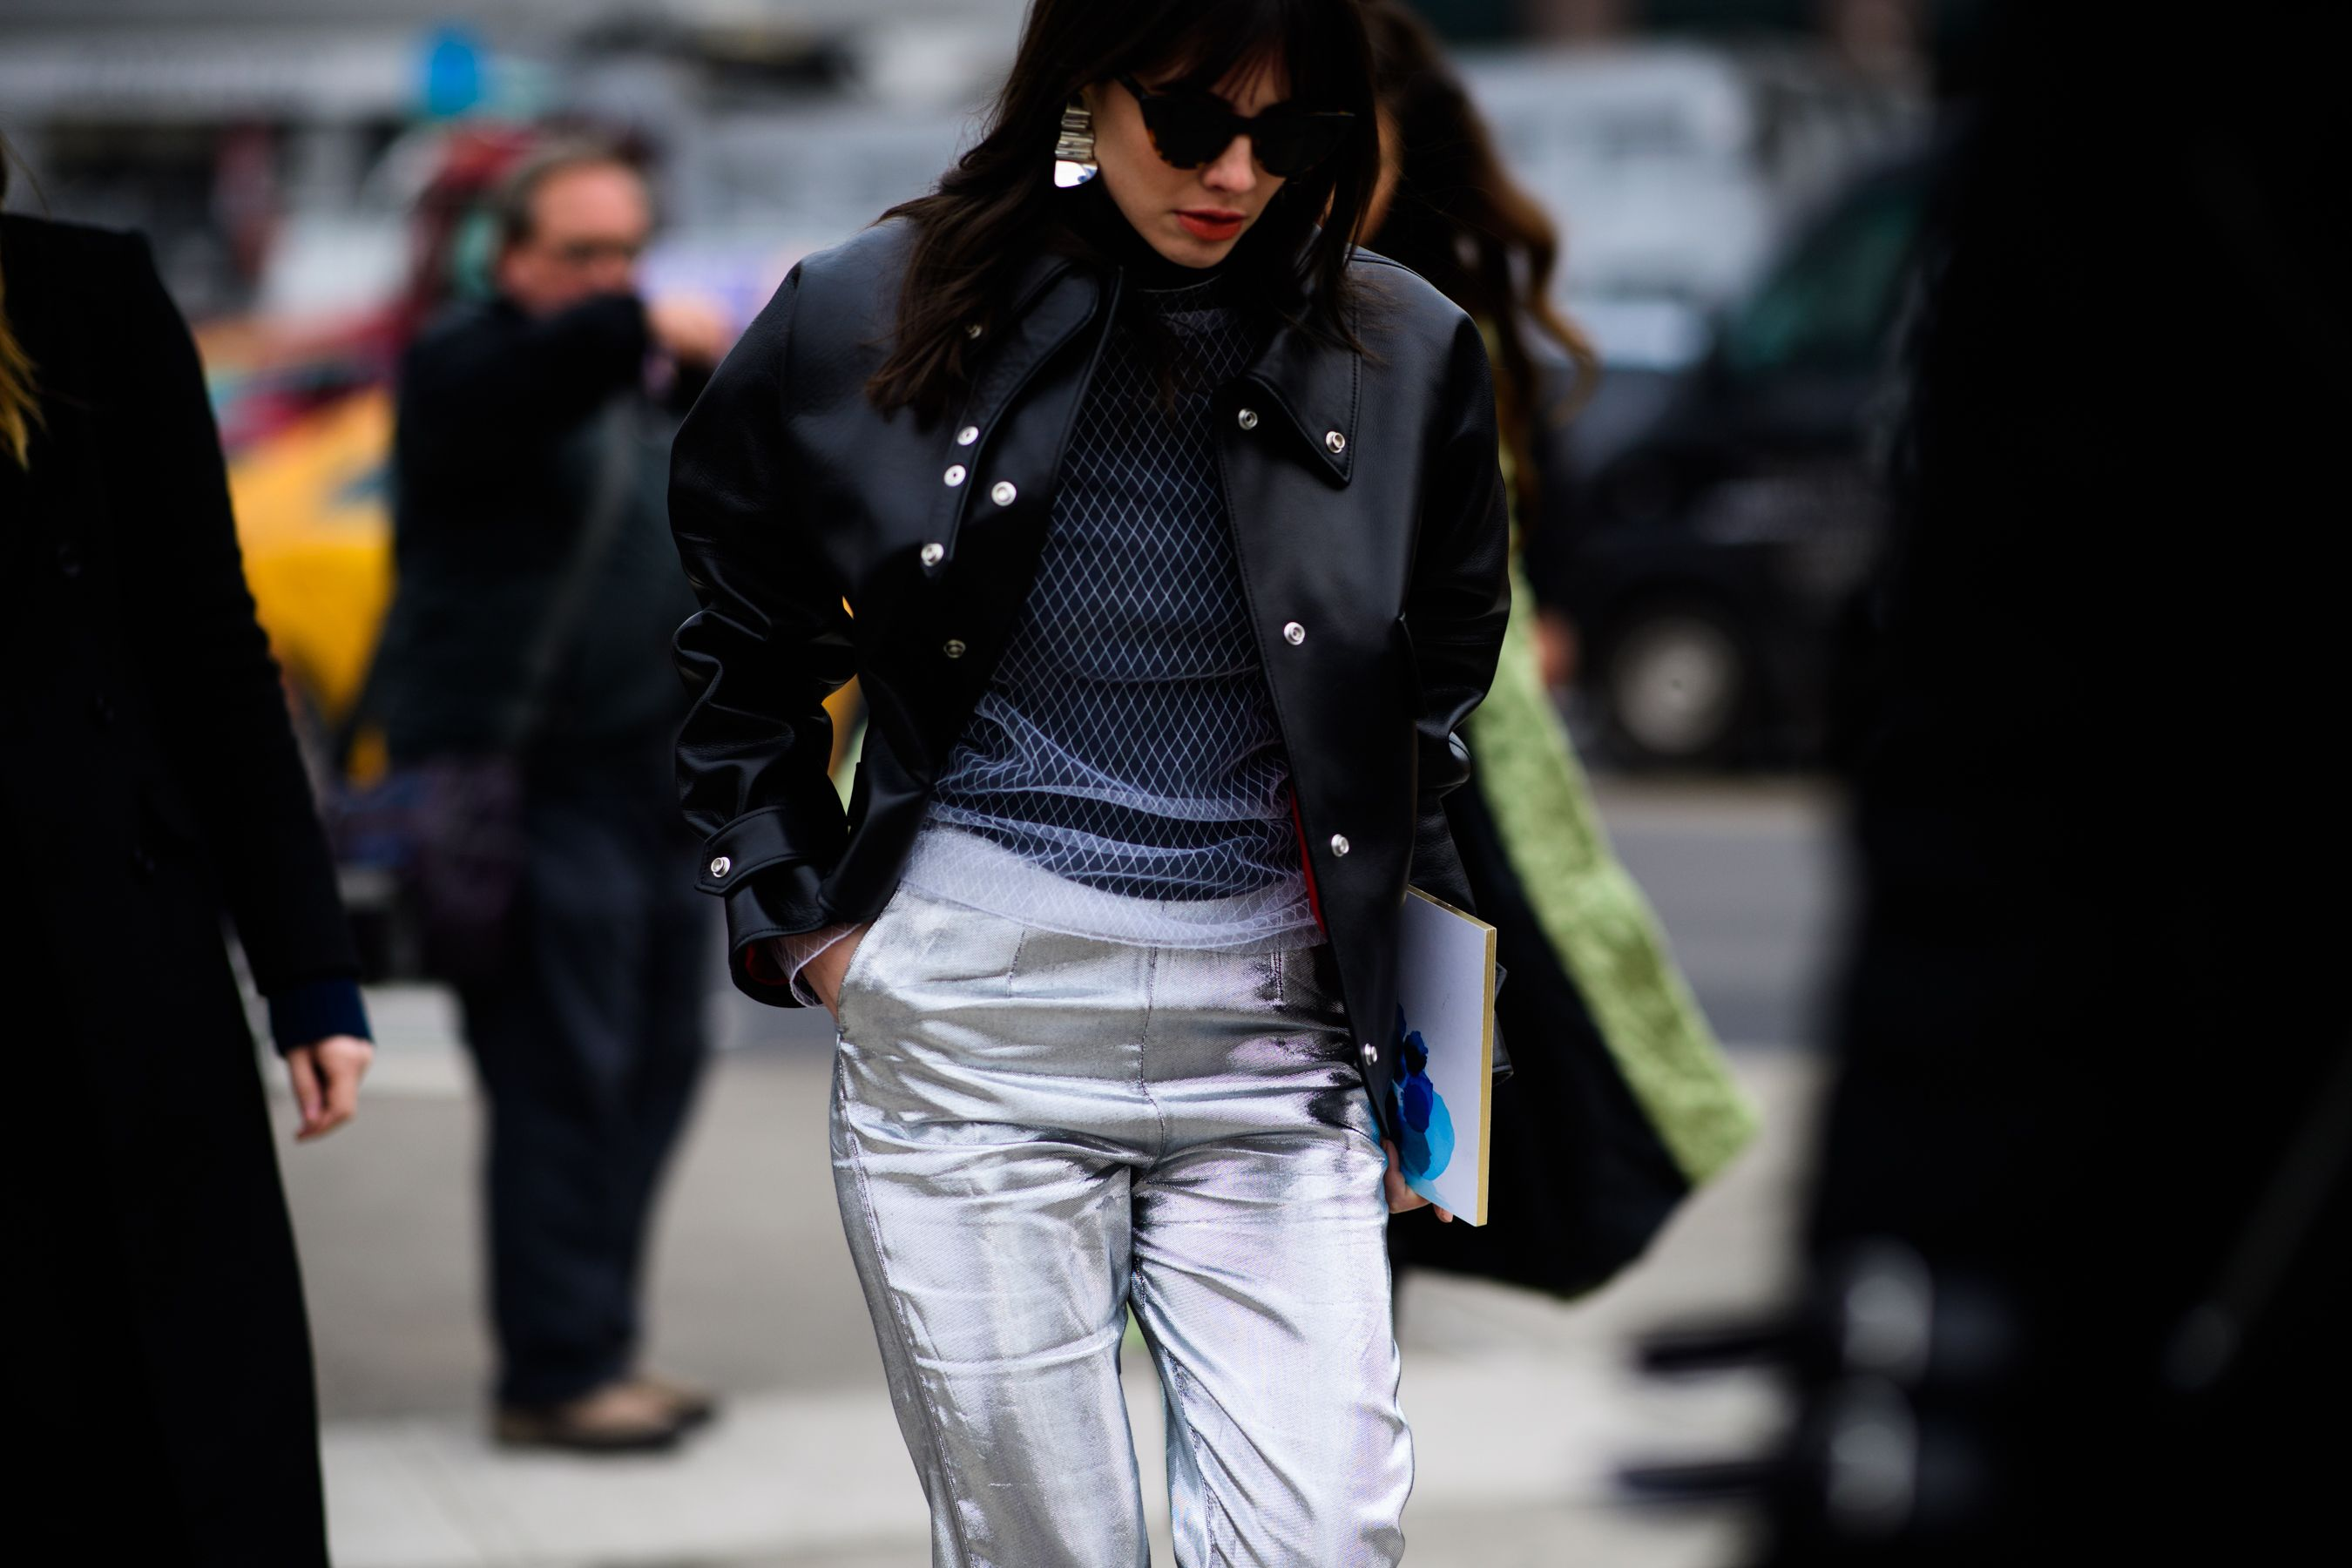 Kat Collings | New York City